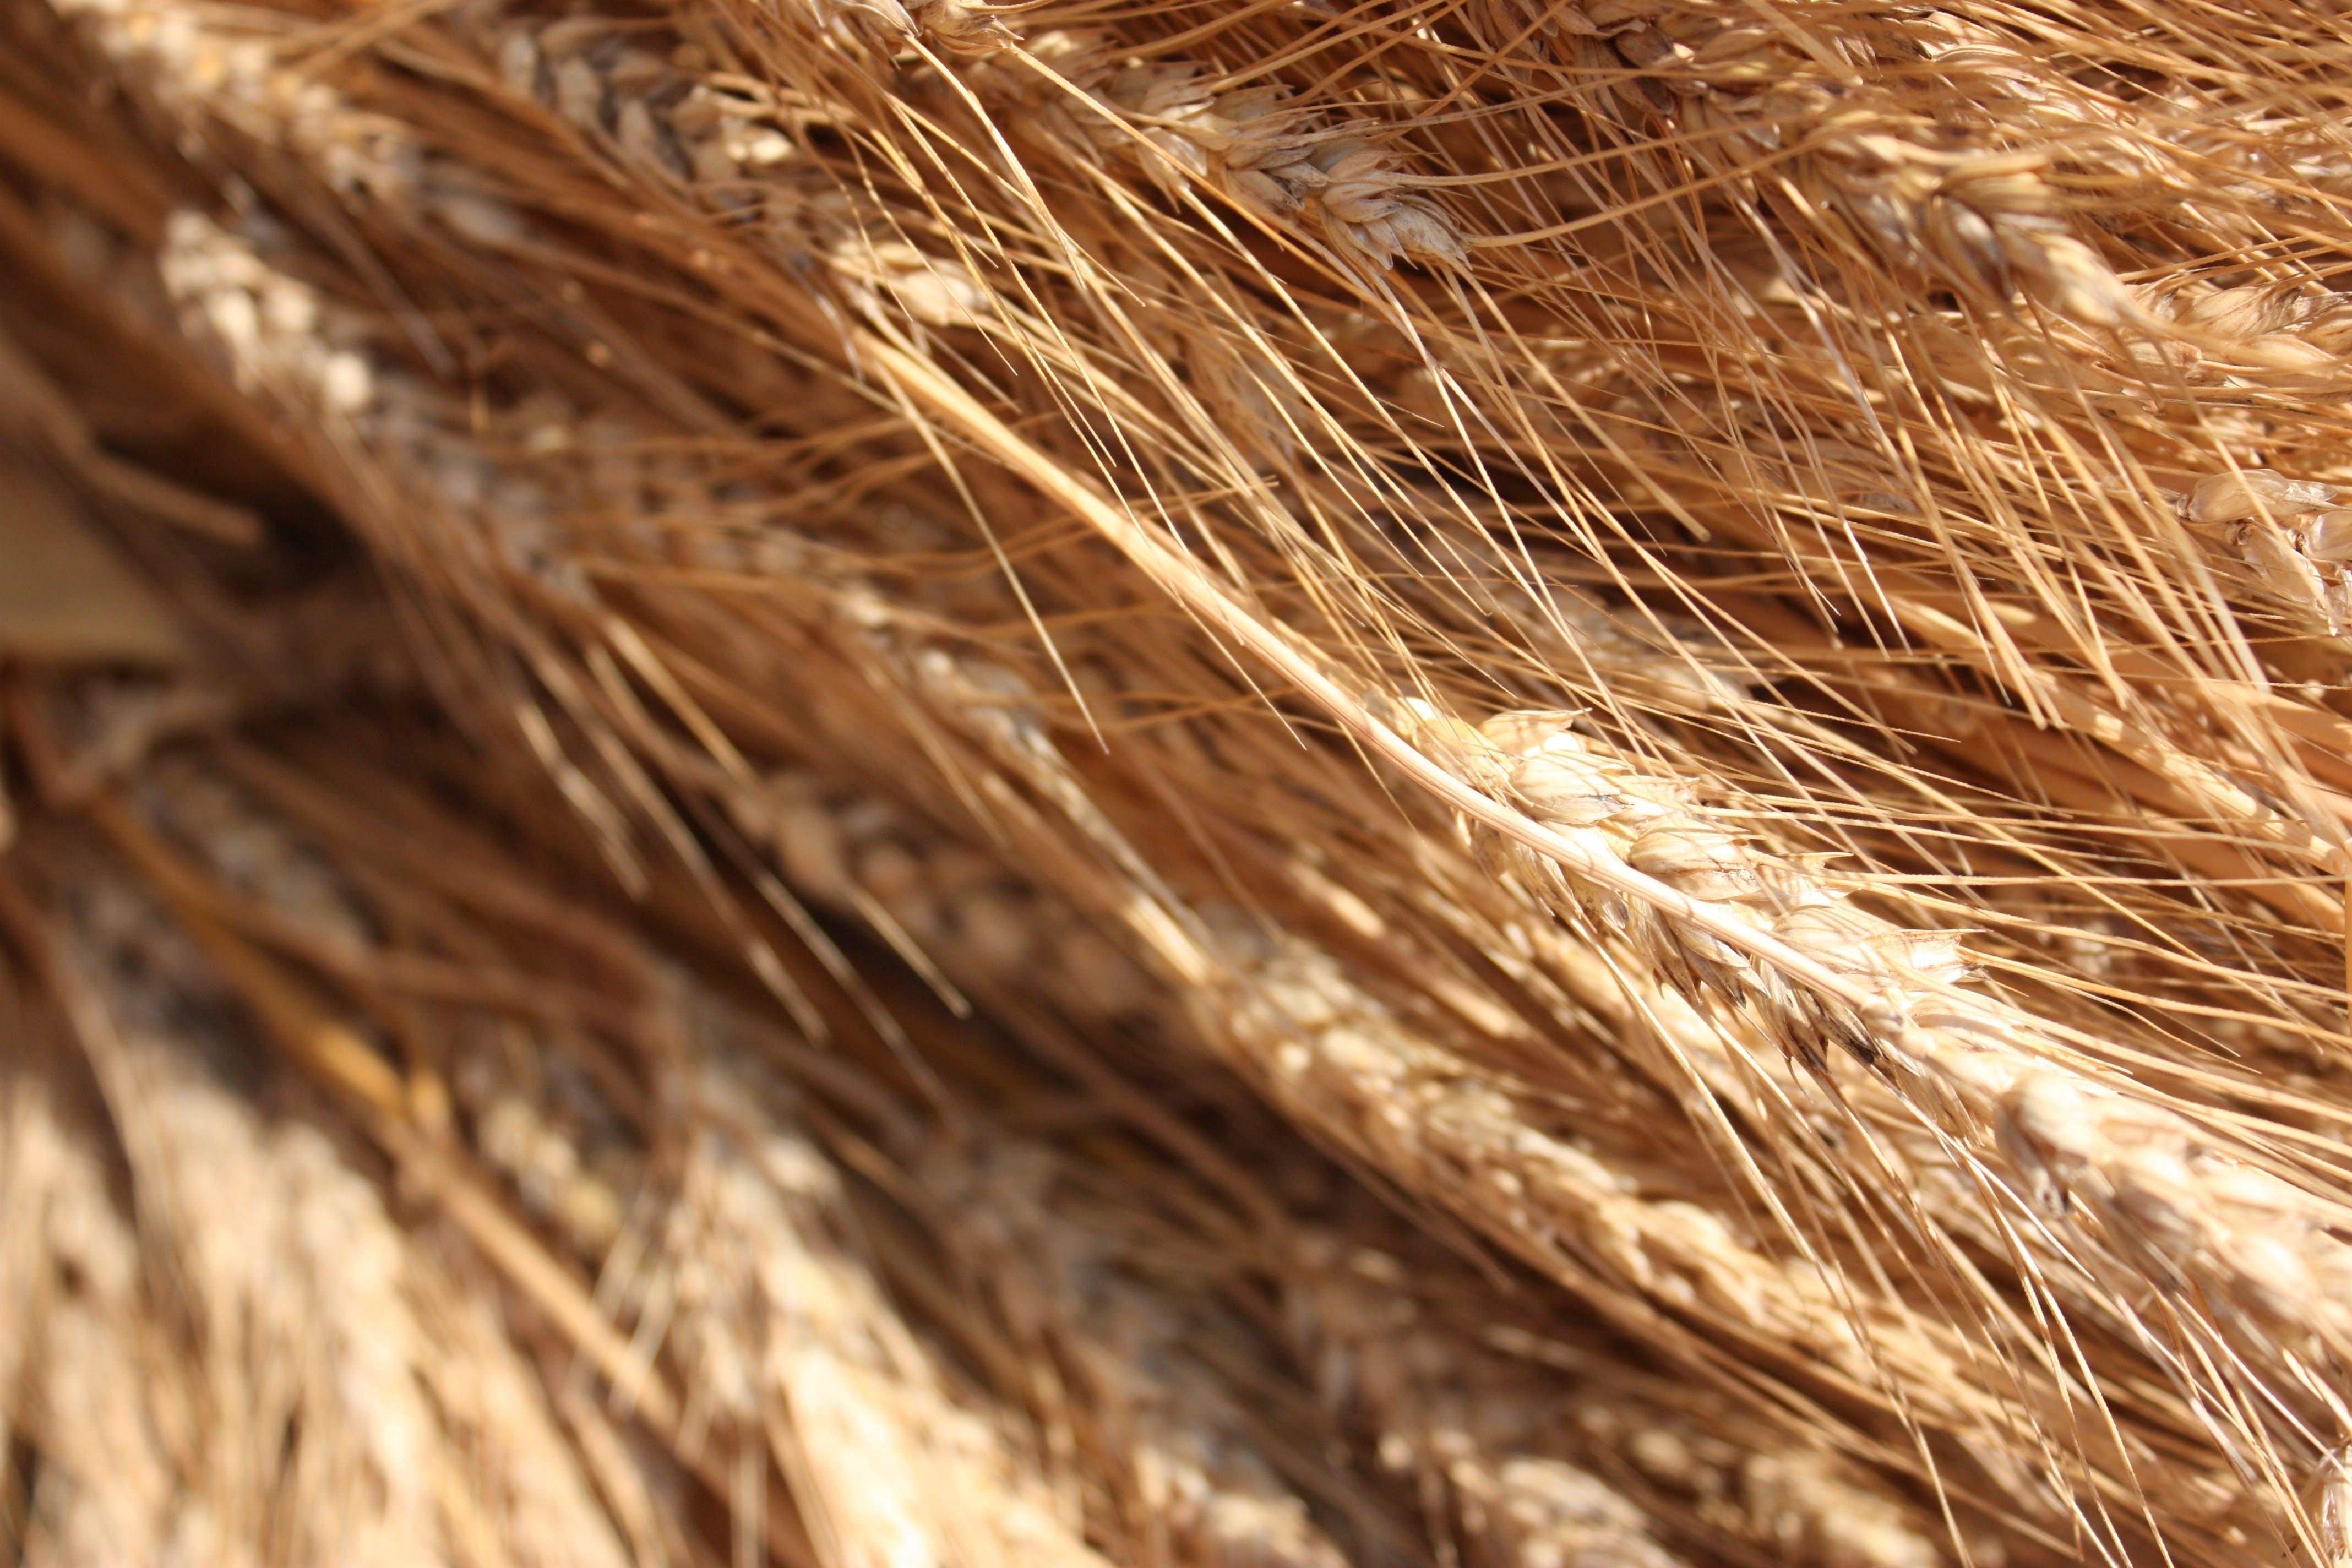 Free stock photo of wheat